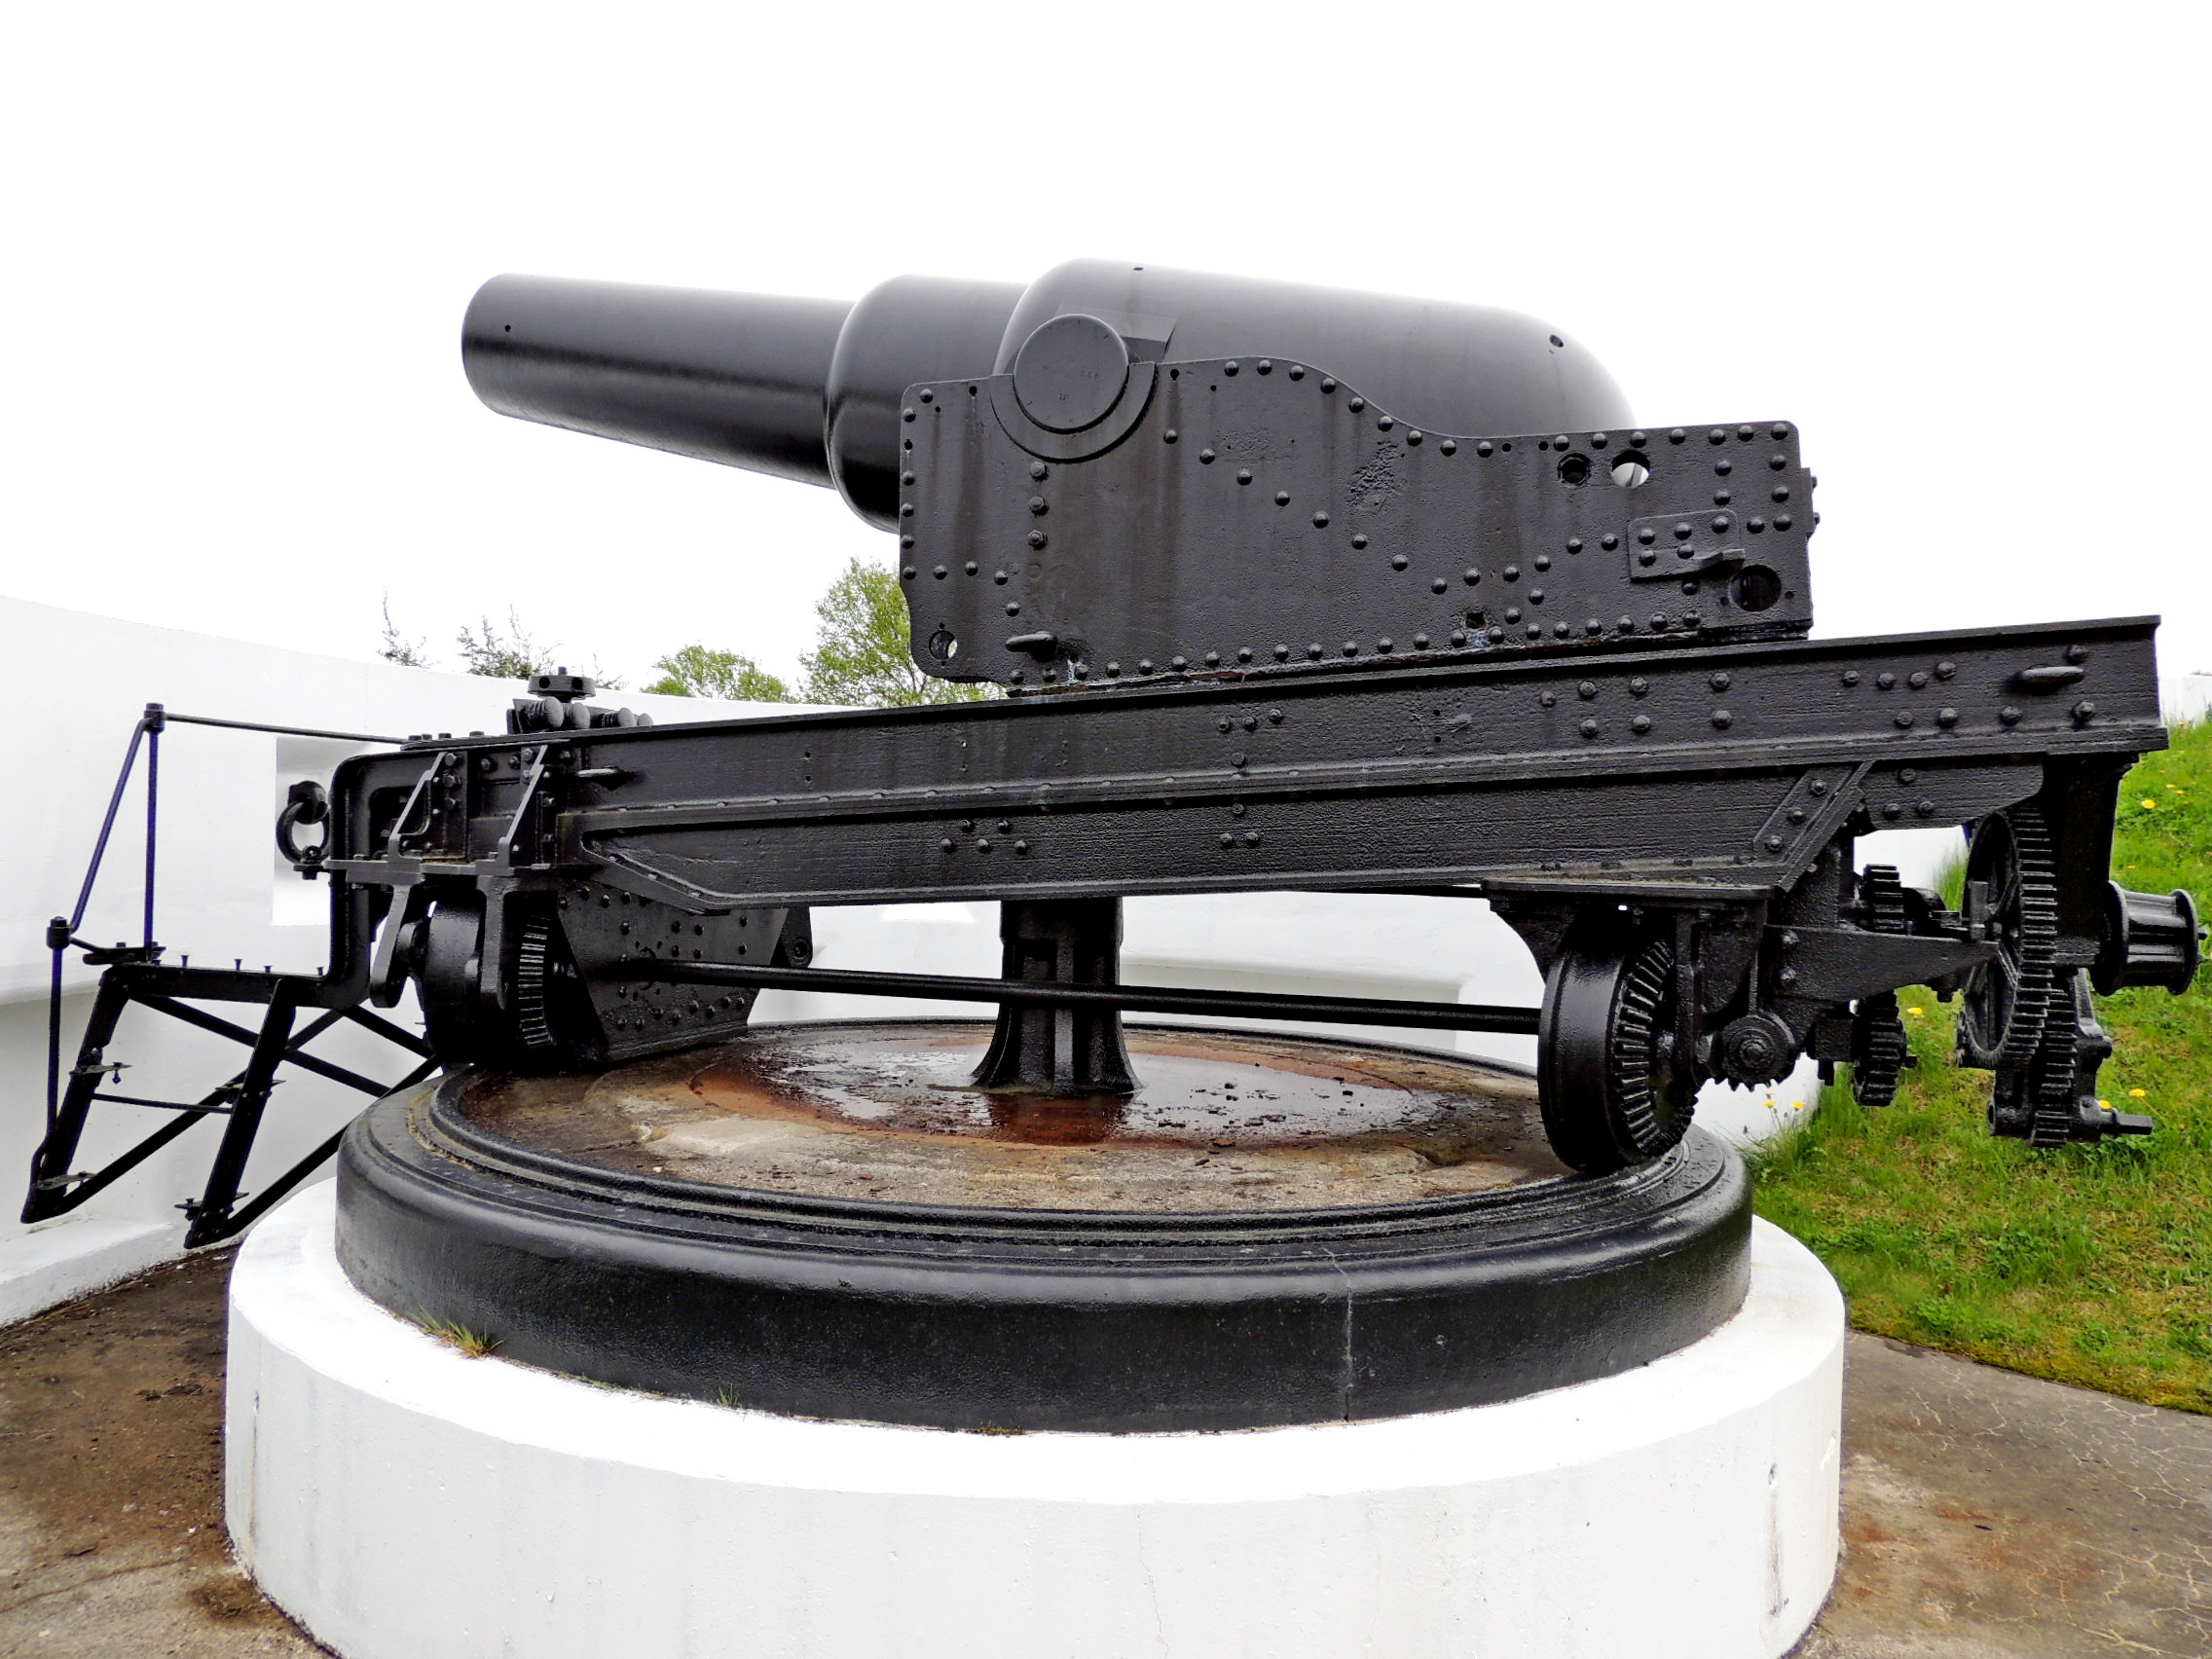 York Redoubt Muzzleloading Rifle Number 4 - Halifax, NS